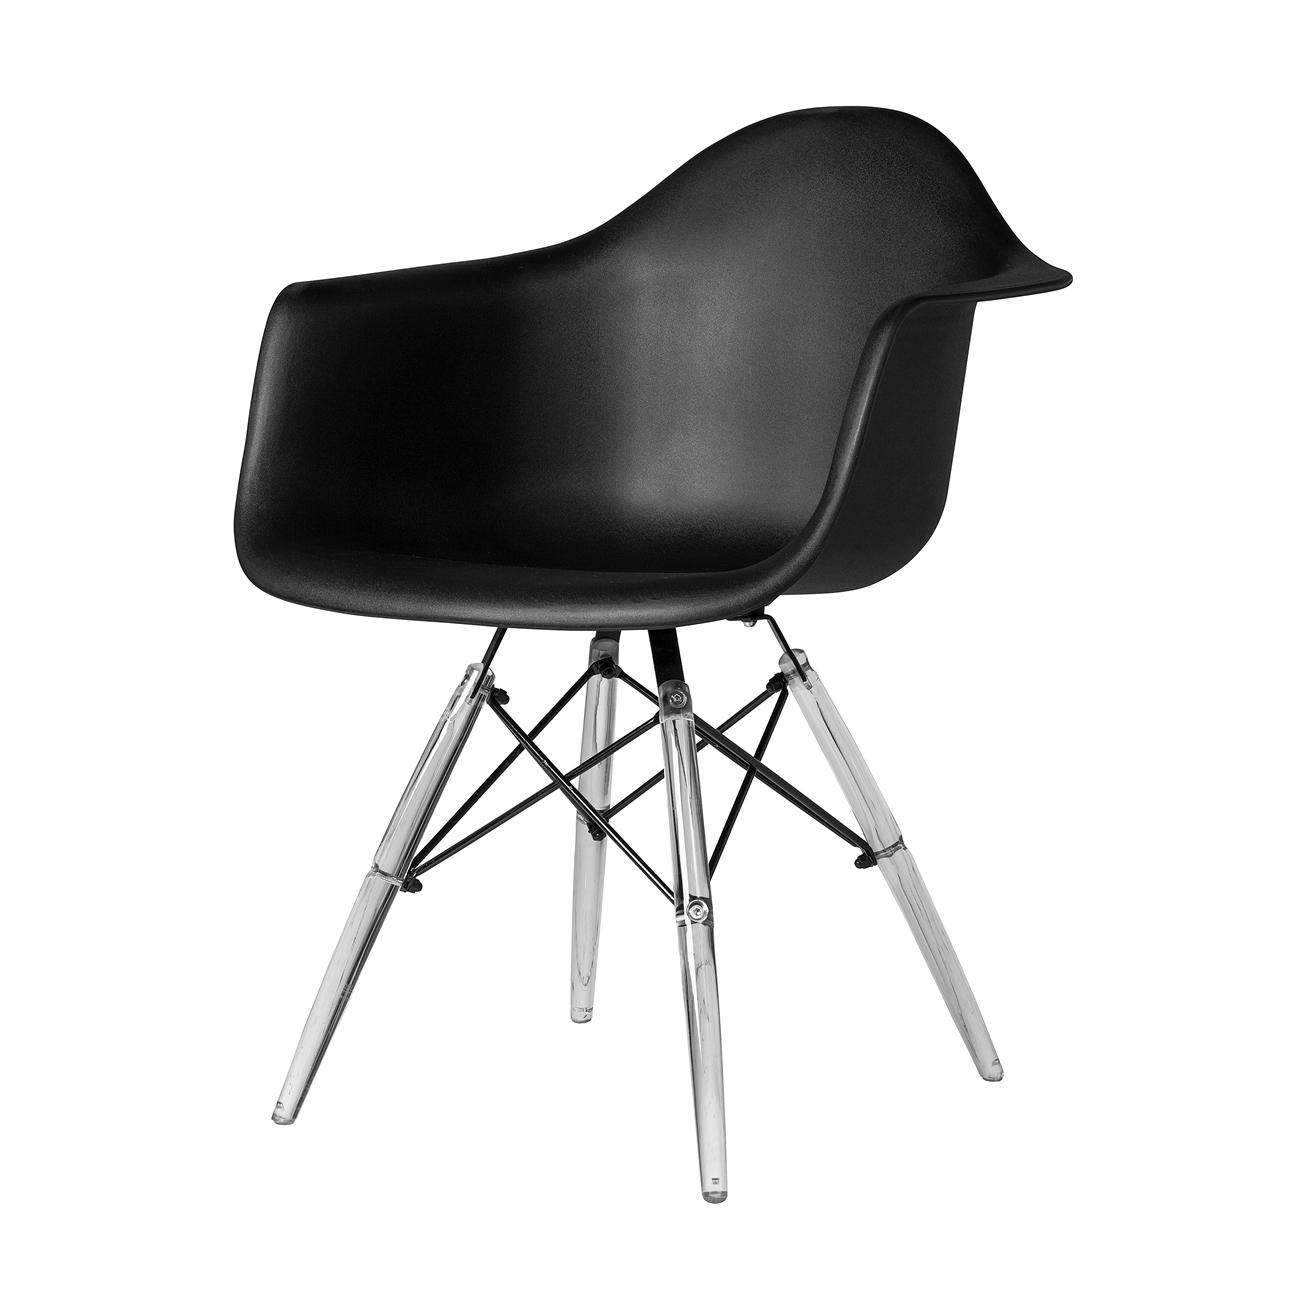 Charles Eames DAW Style Arm Chair - Black Seat and Legs  sc 1 st  The Khazana & Charles Eames DAW Style Arm Chair - Black Seat and Legs The Khazana ...